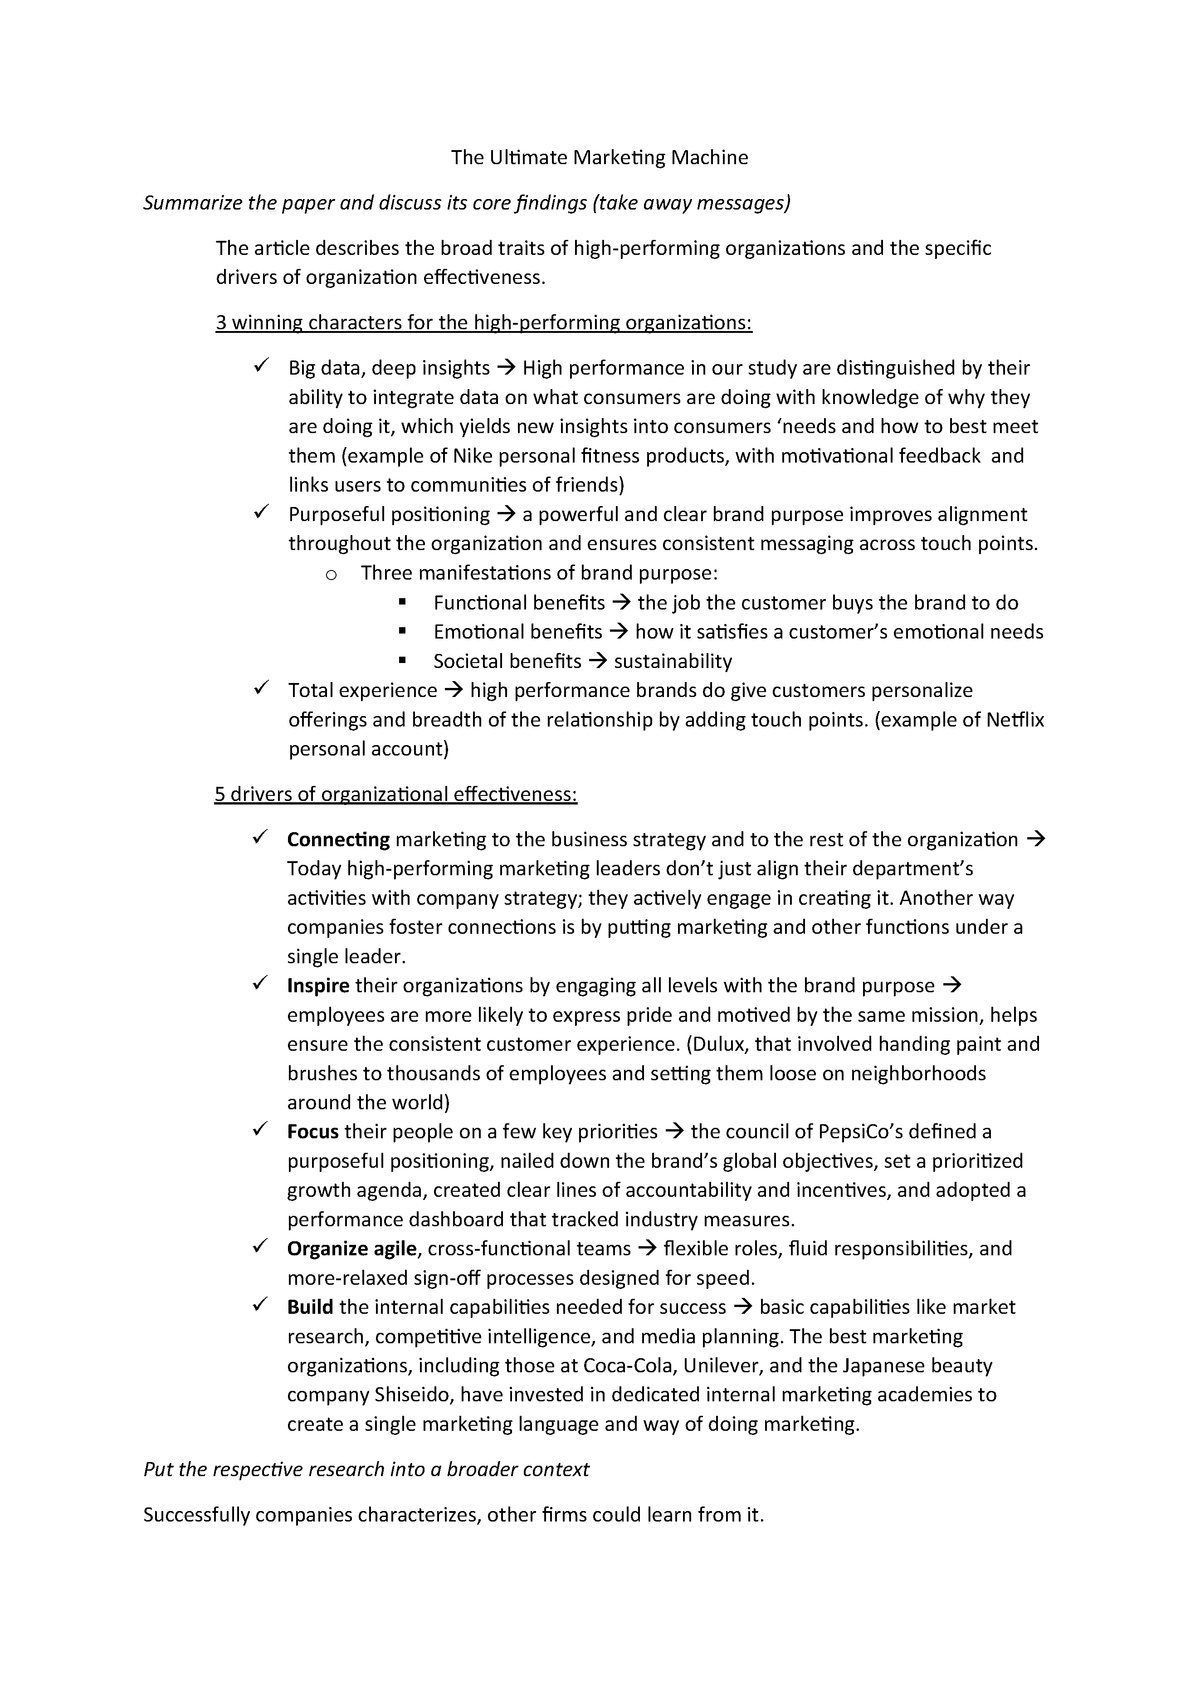 summarize paper